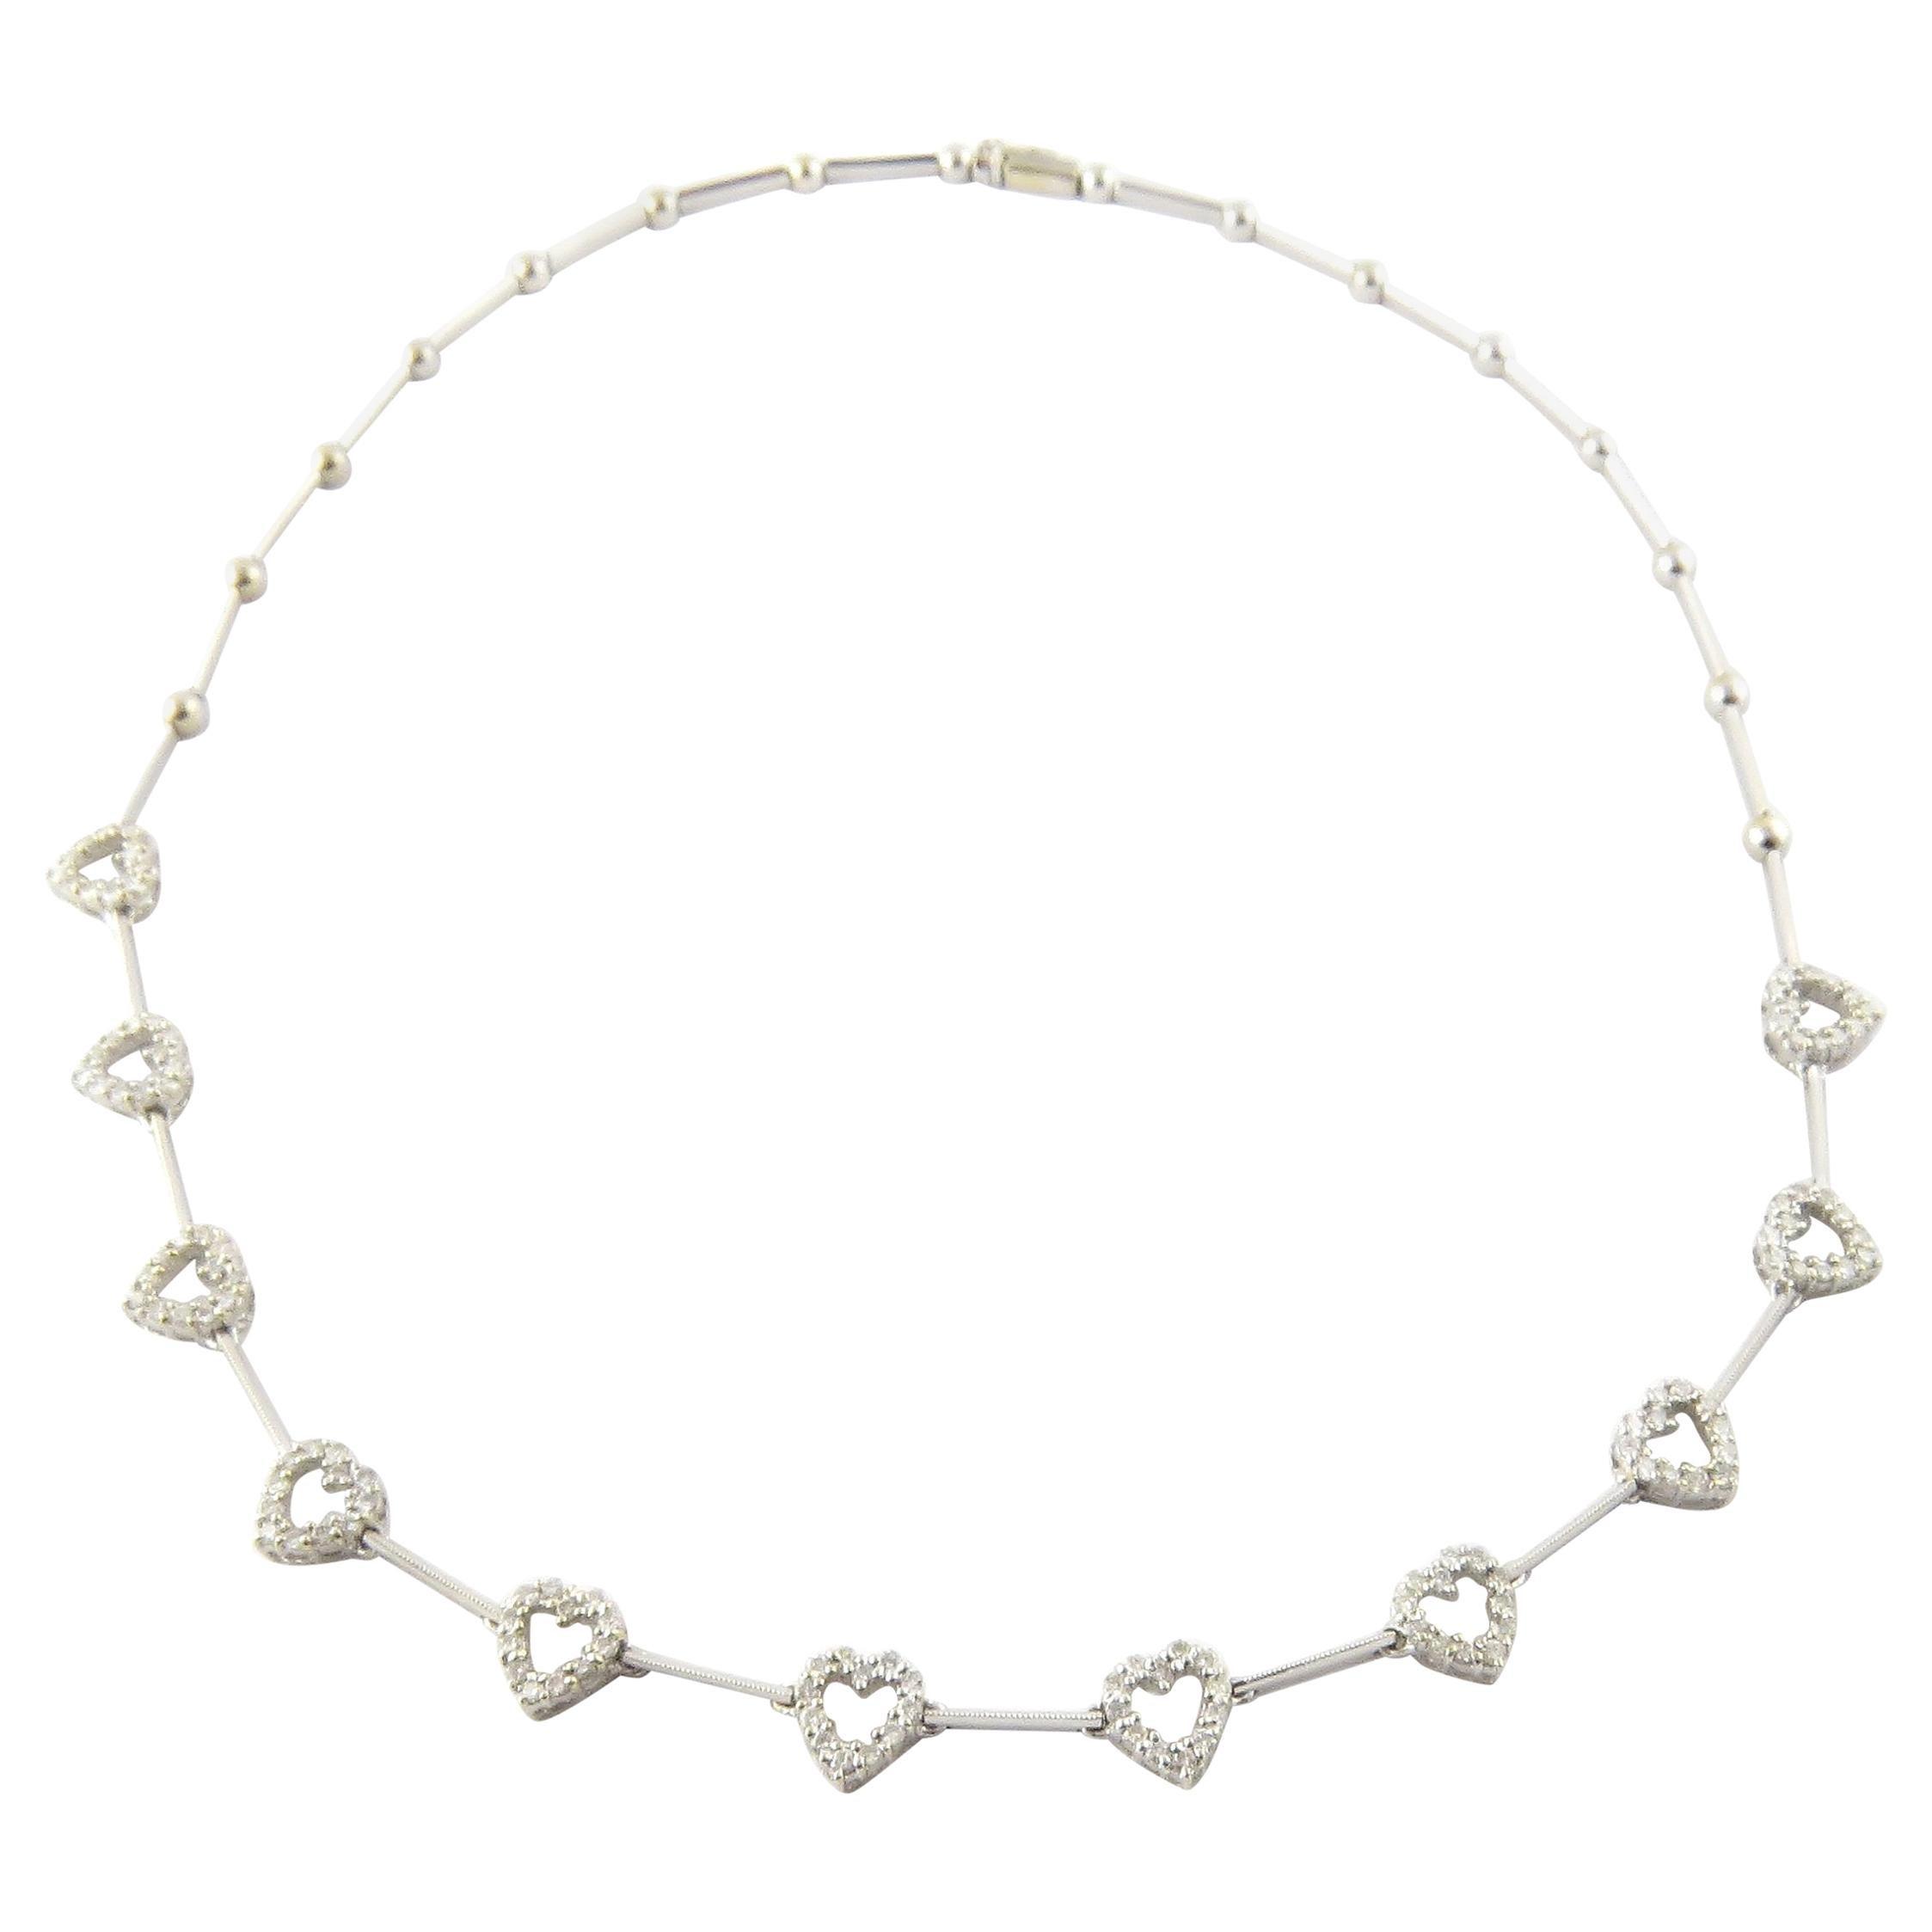 18 Karat White Gold Diamond Heart Necklace